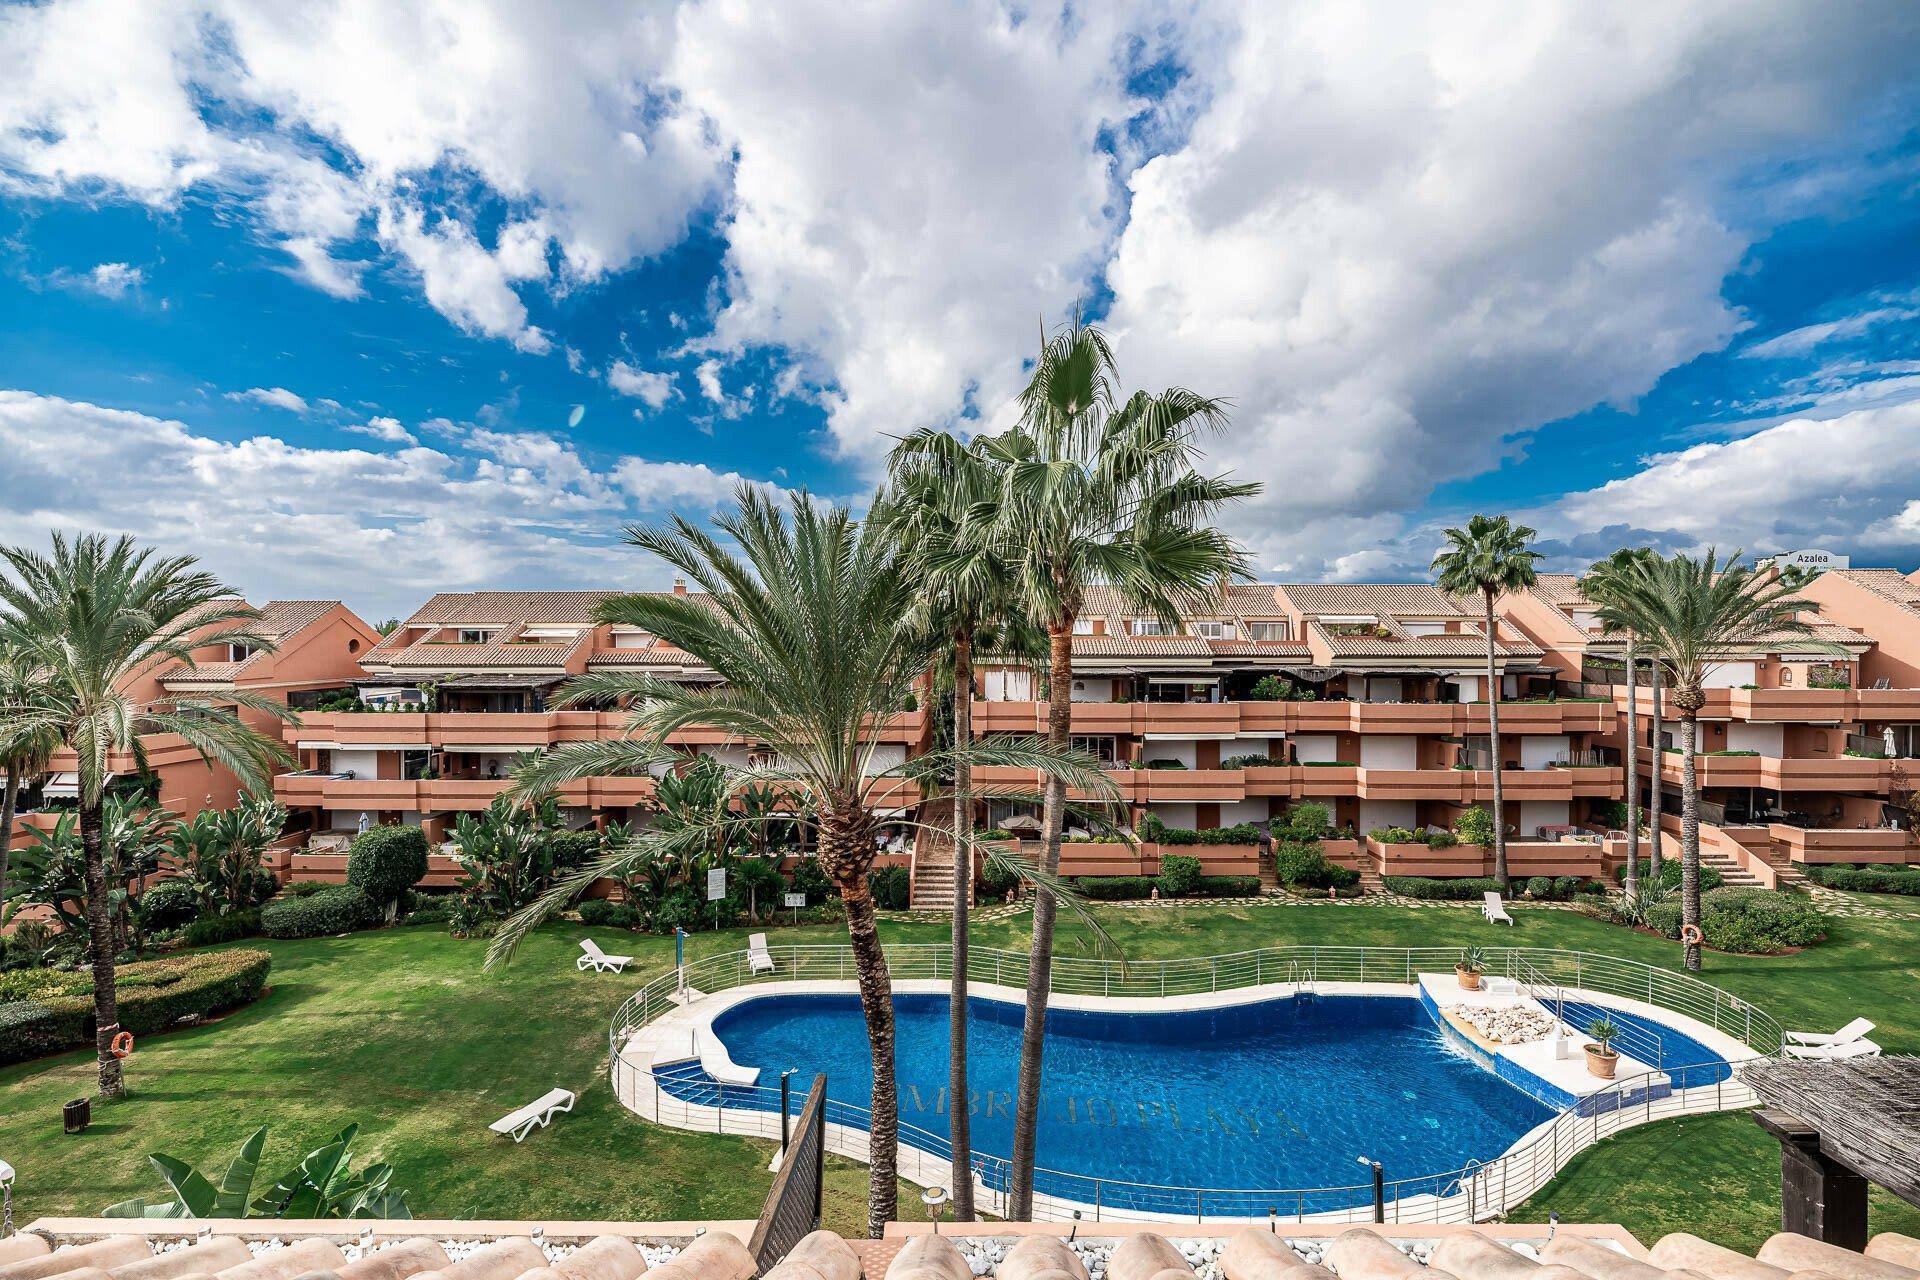 Marbella, Andalusia, Spain 1